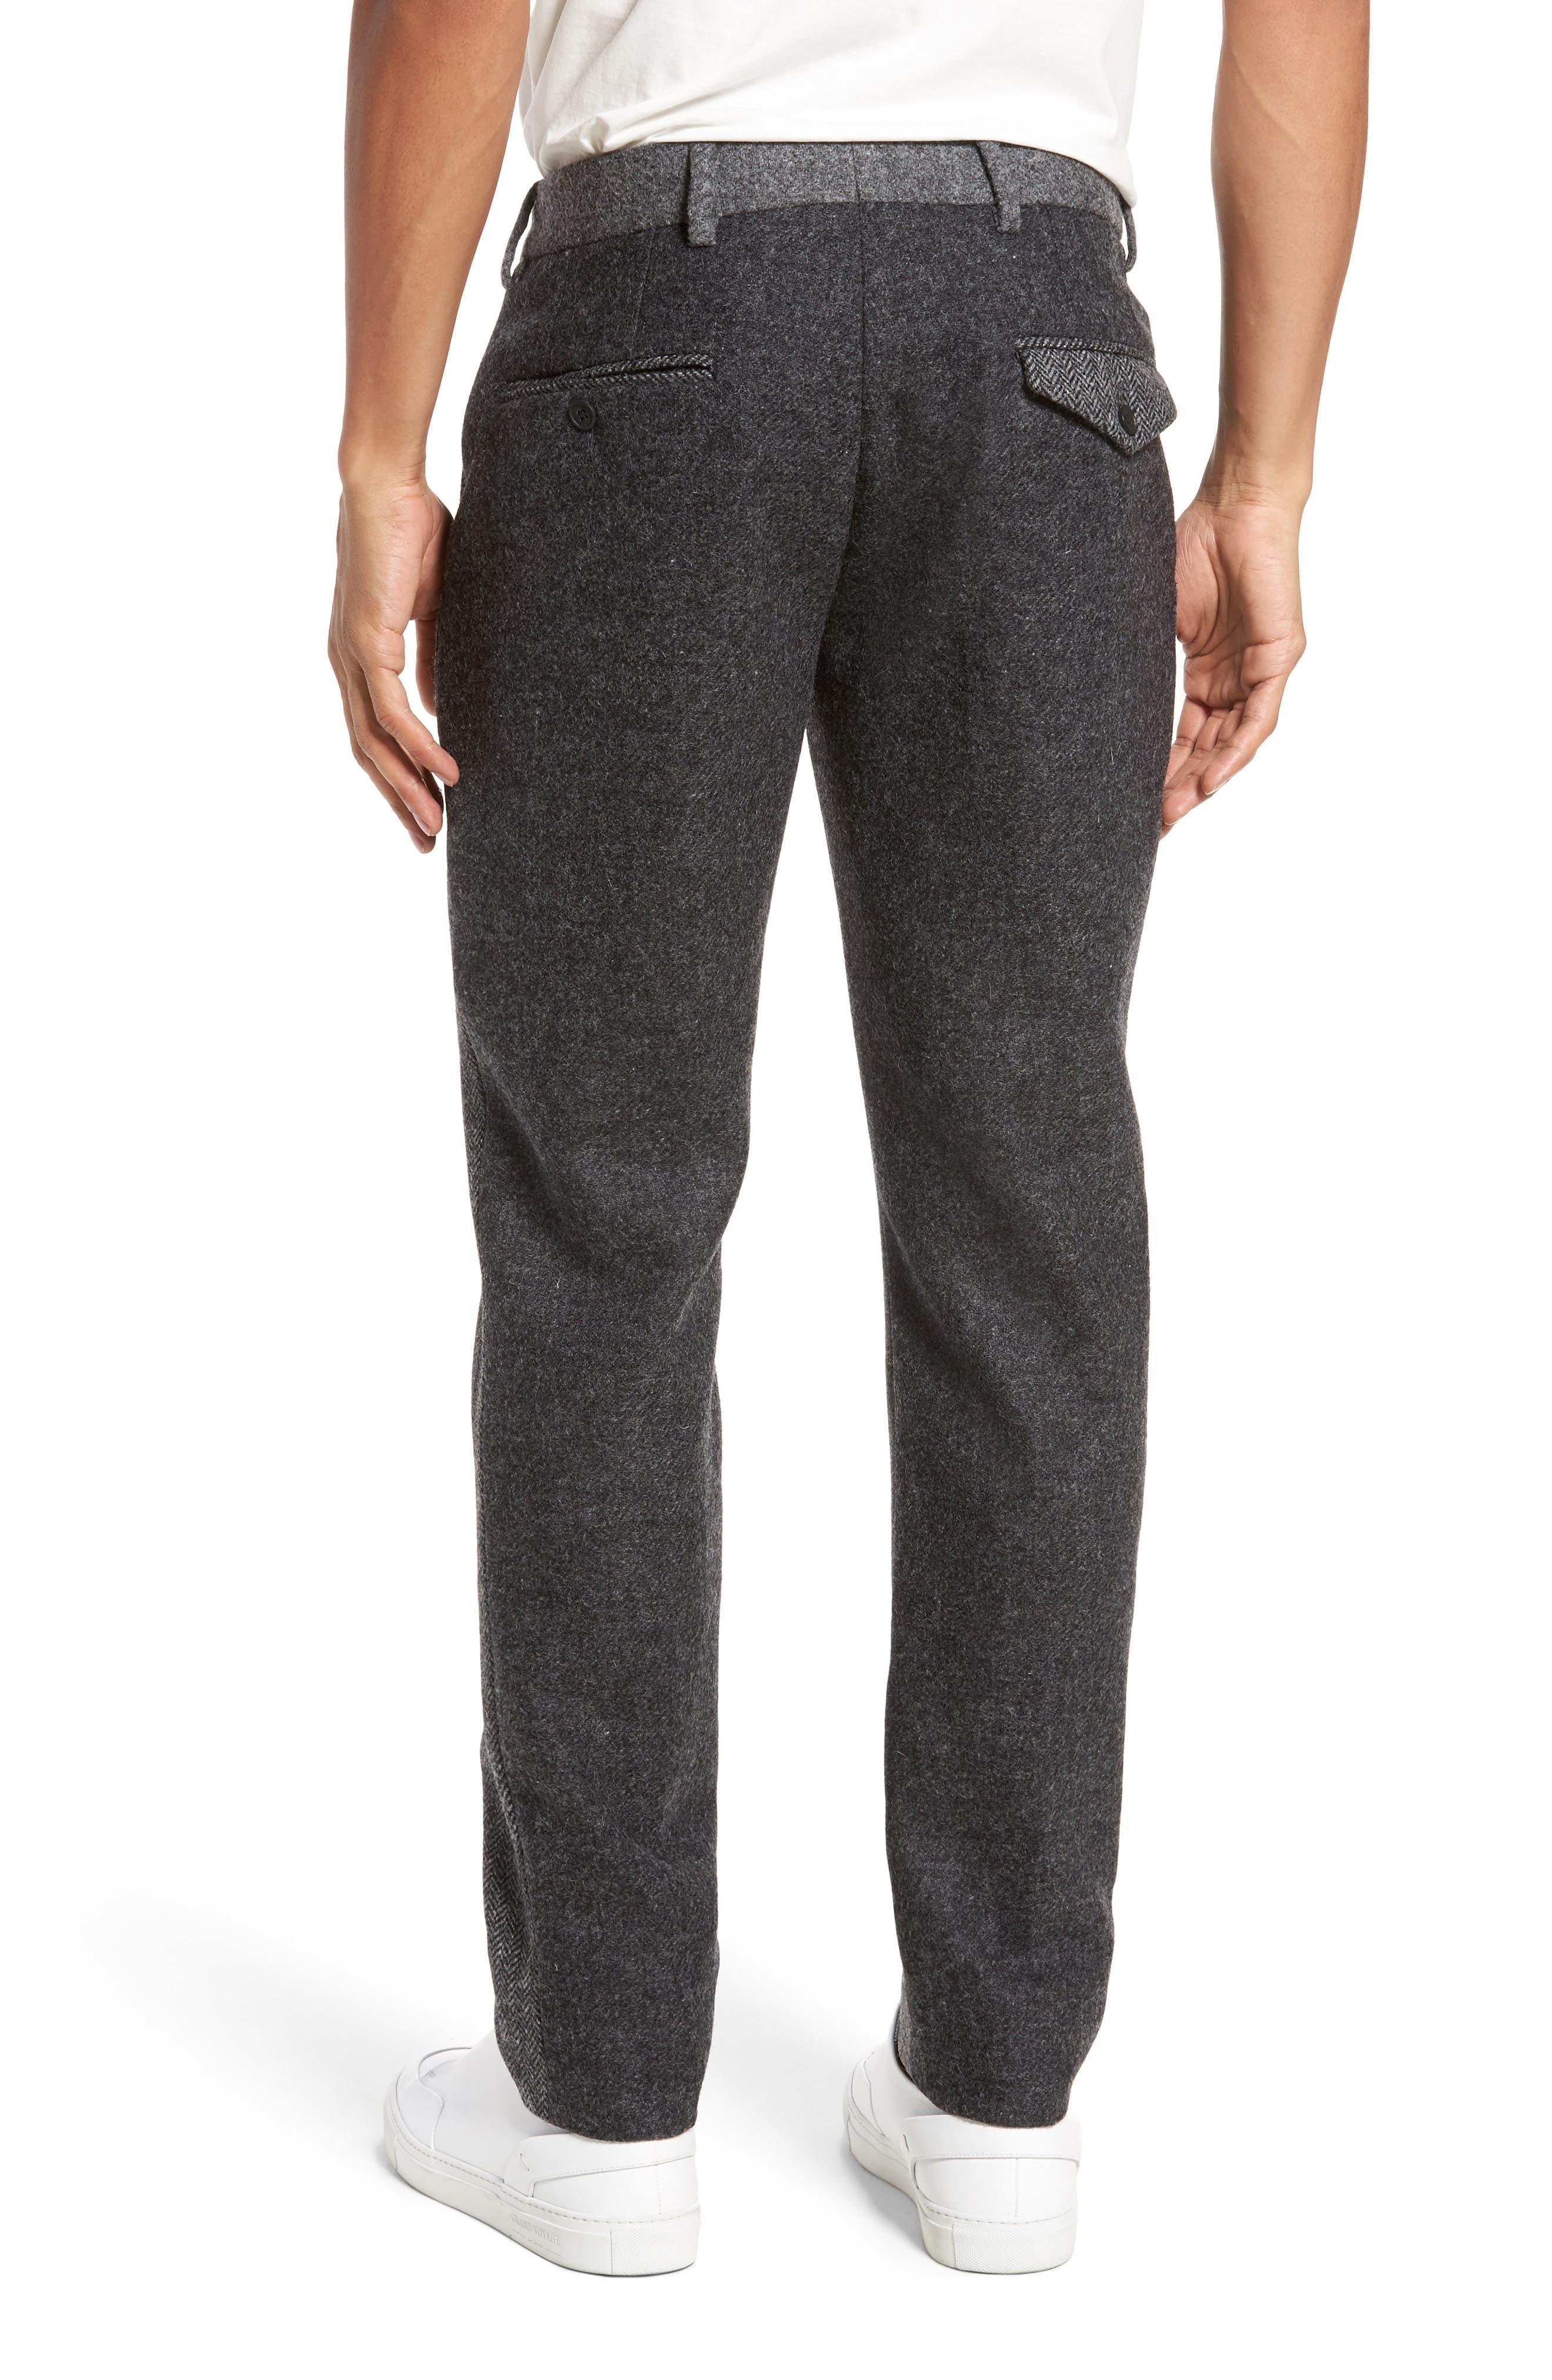 Patchwork Wool Trousers,                             Alternate thumbnail 2, color,                             Grey Melange